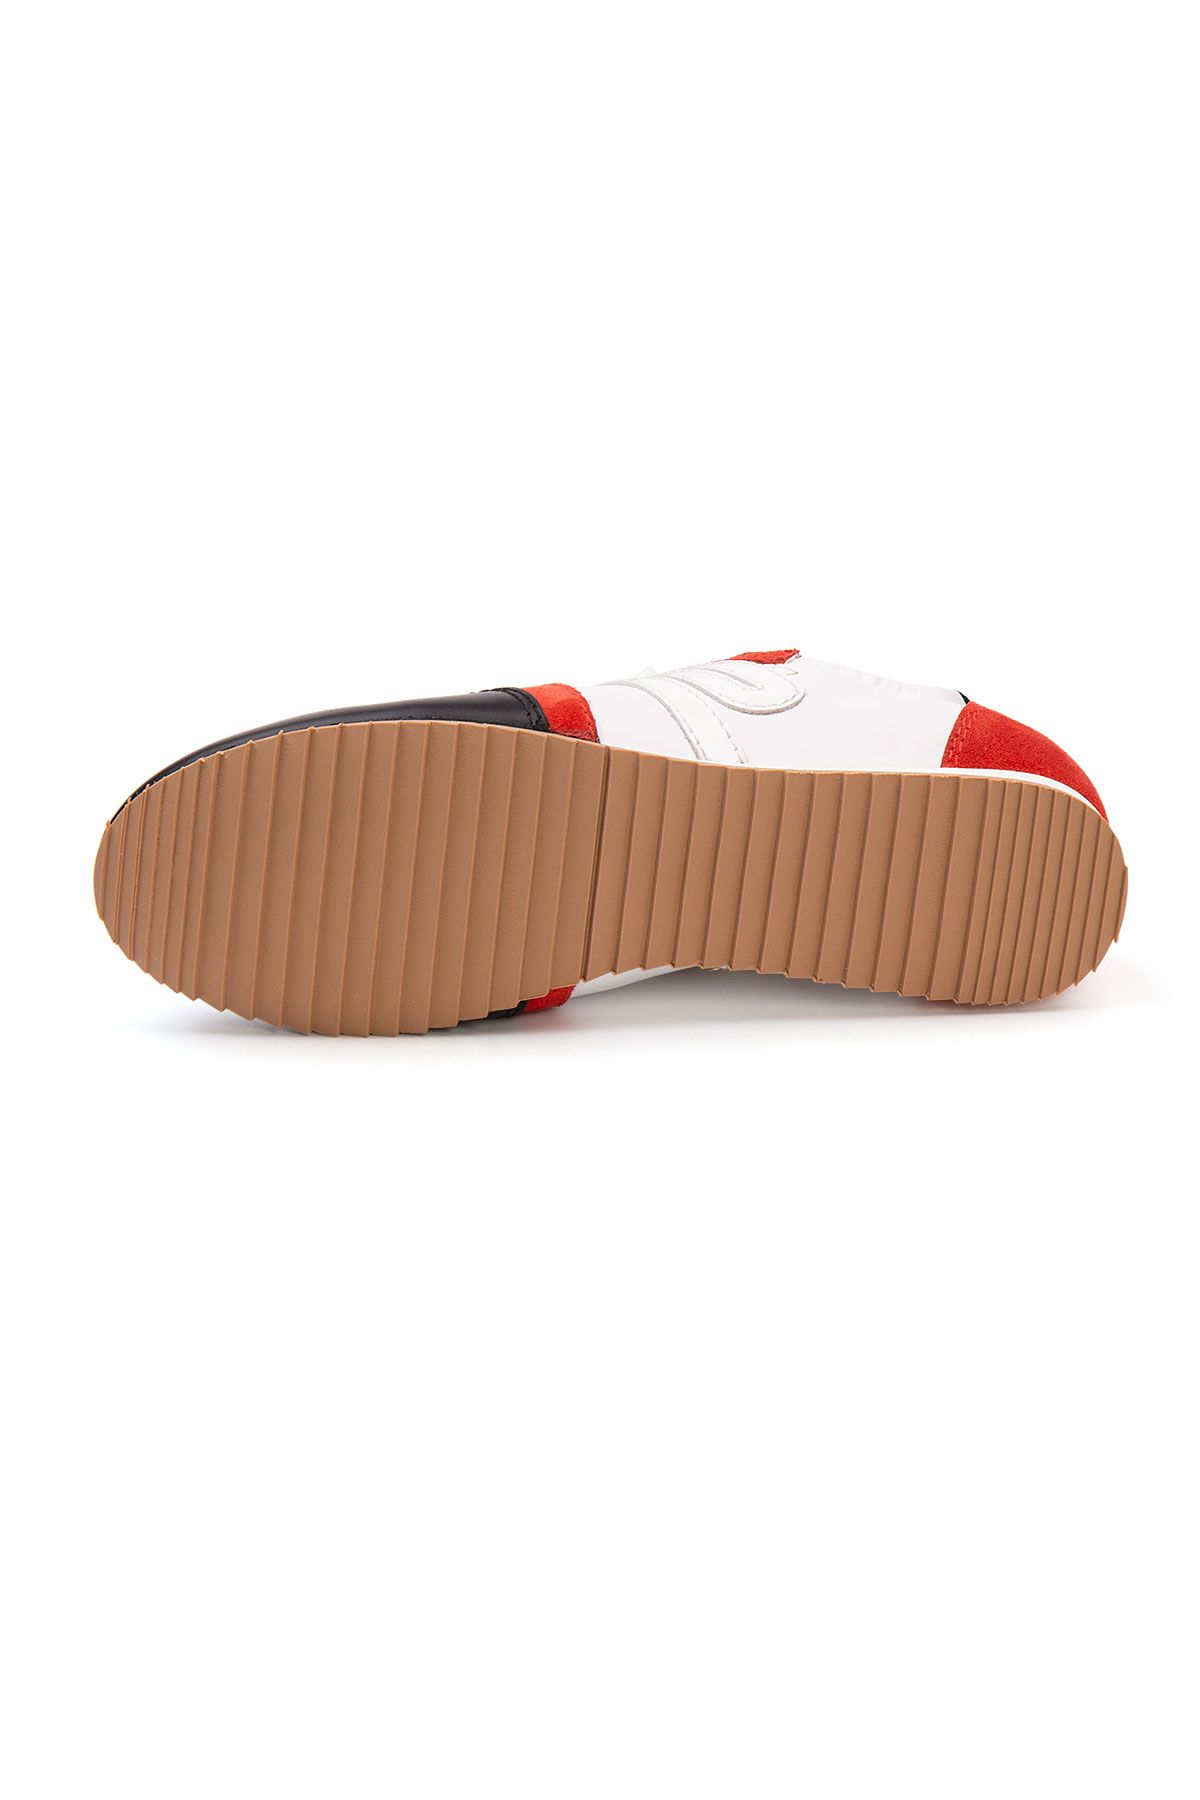 San Women's Leather Sneakers SAN06S Black